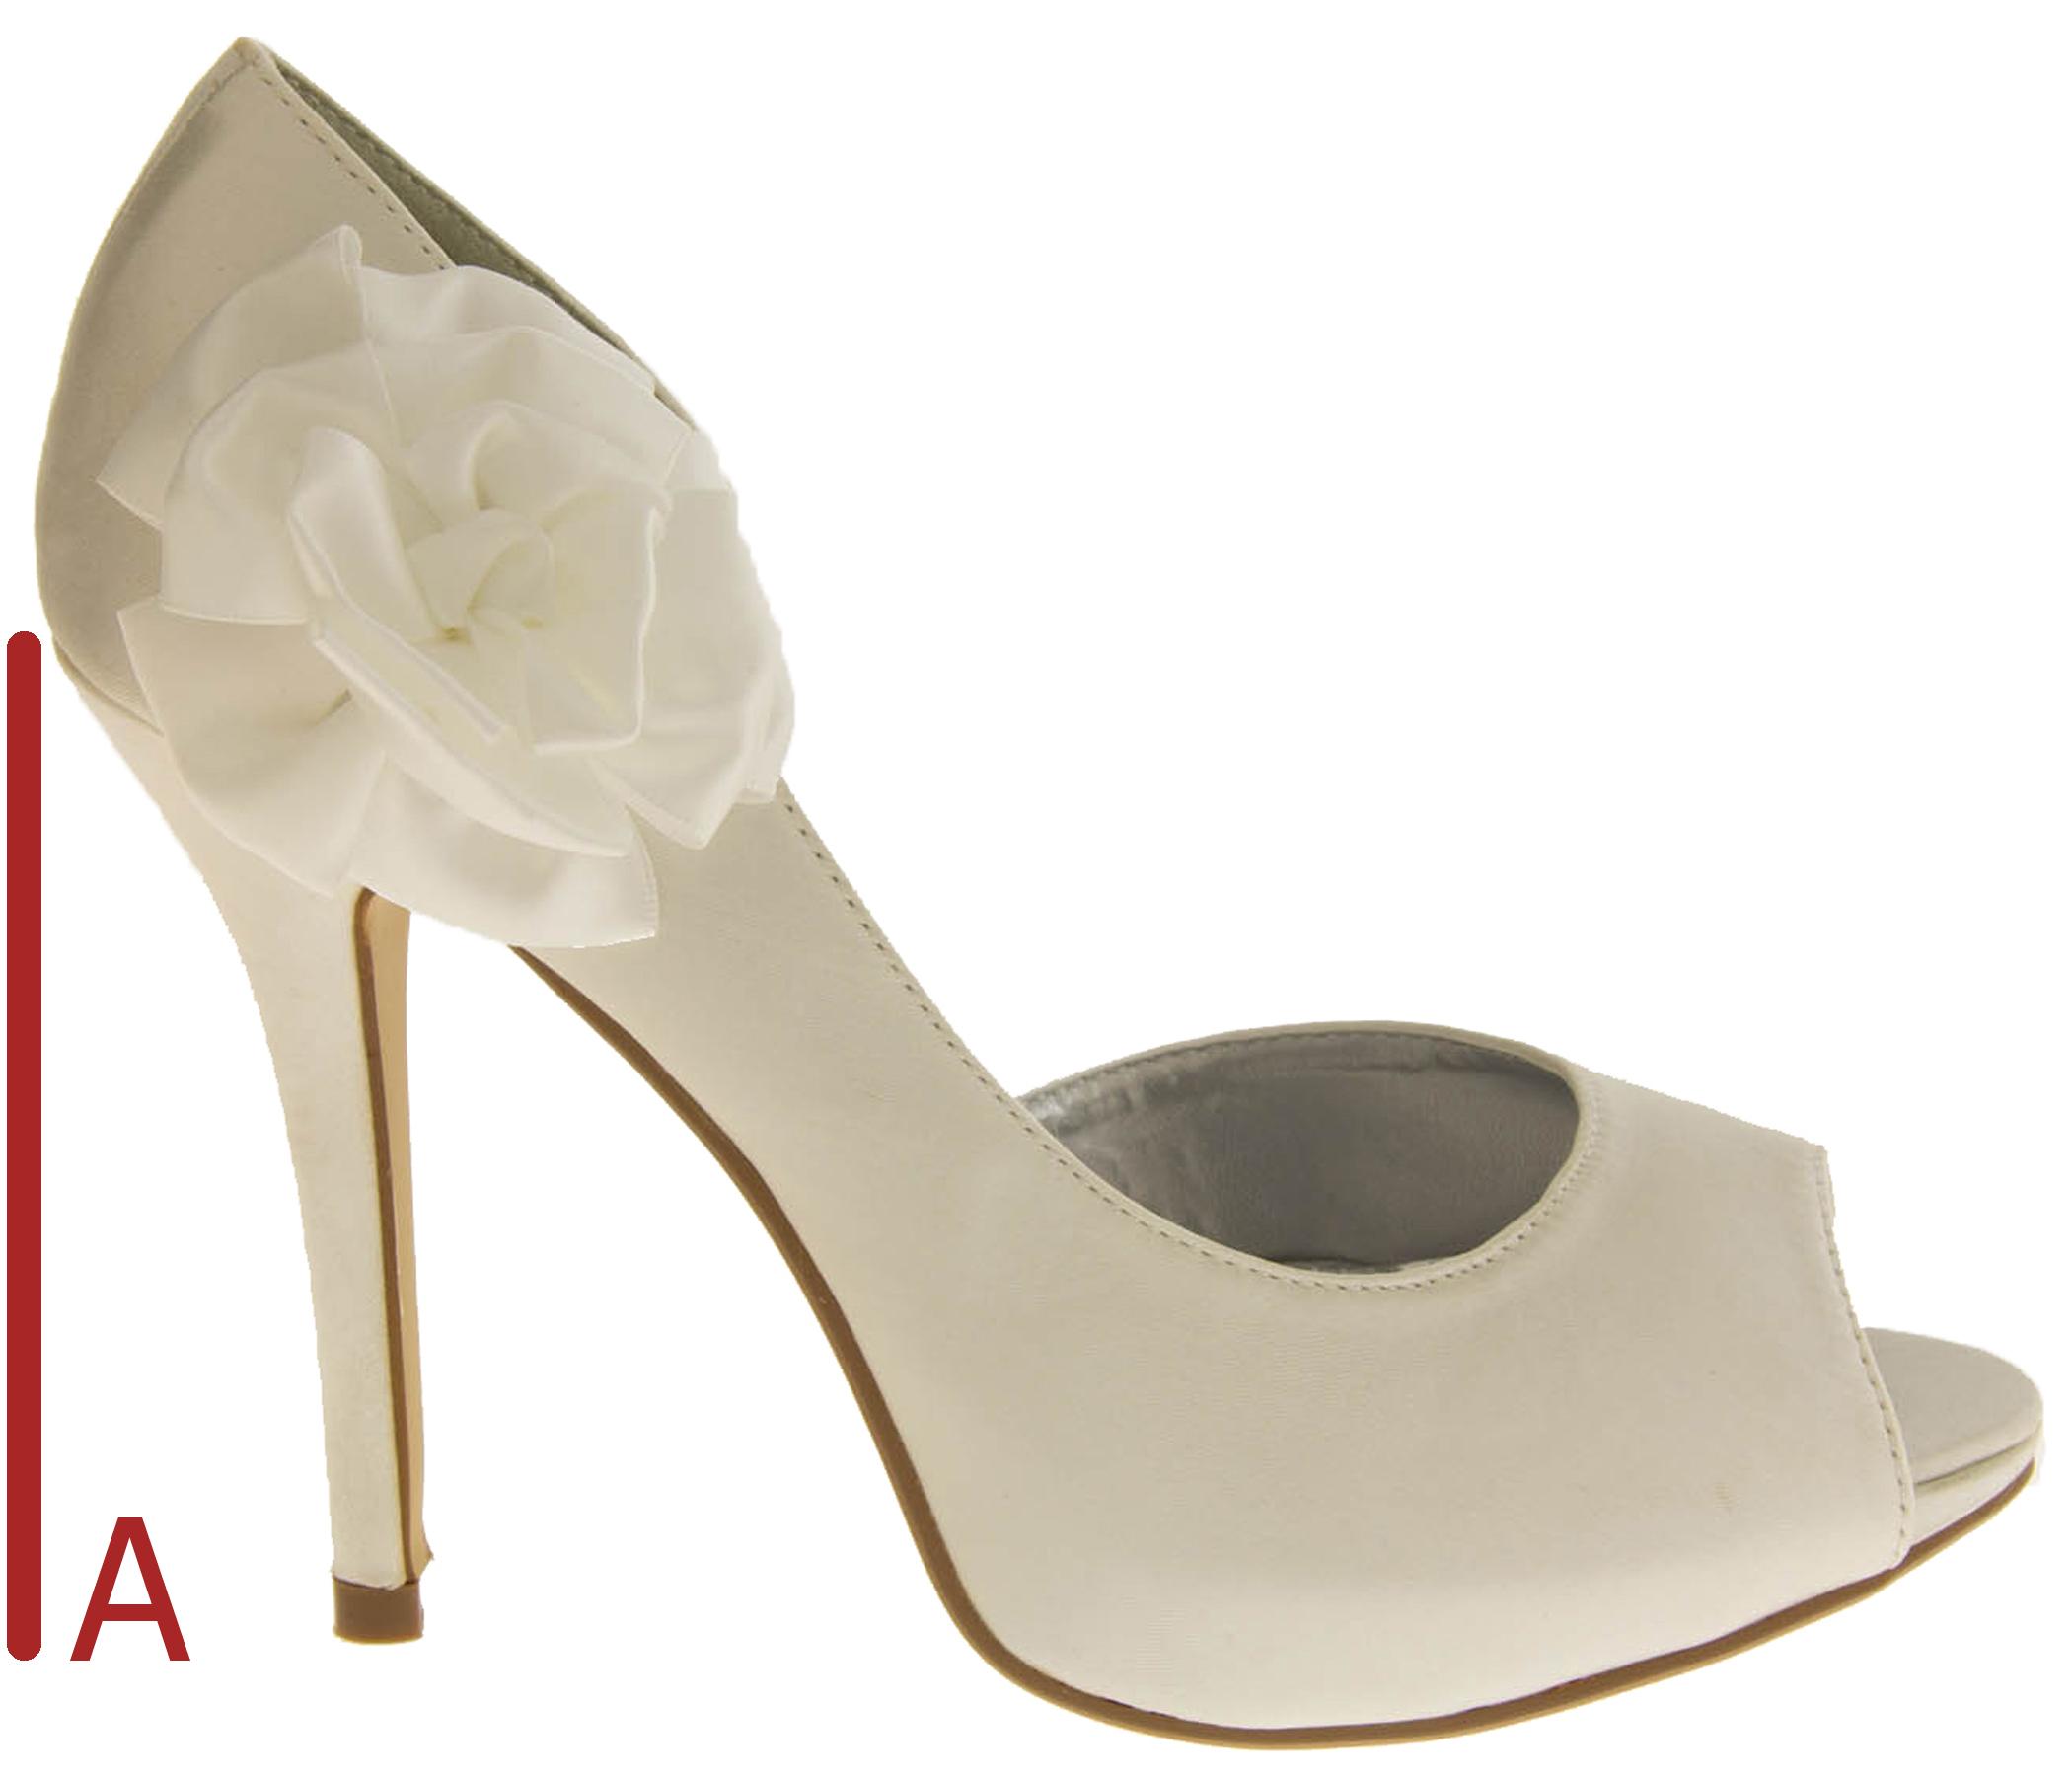 Shoe Diagram